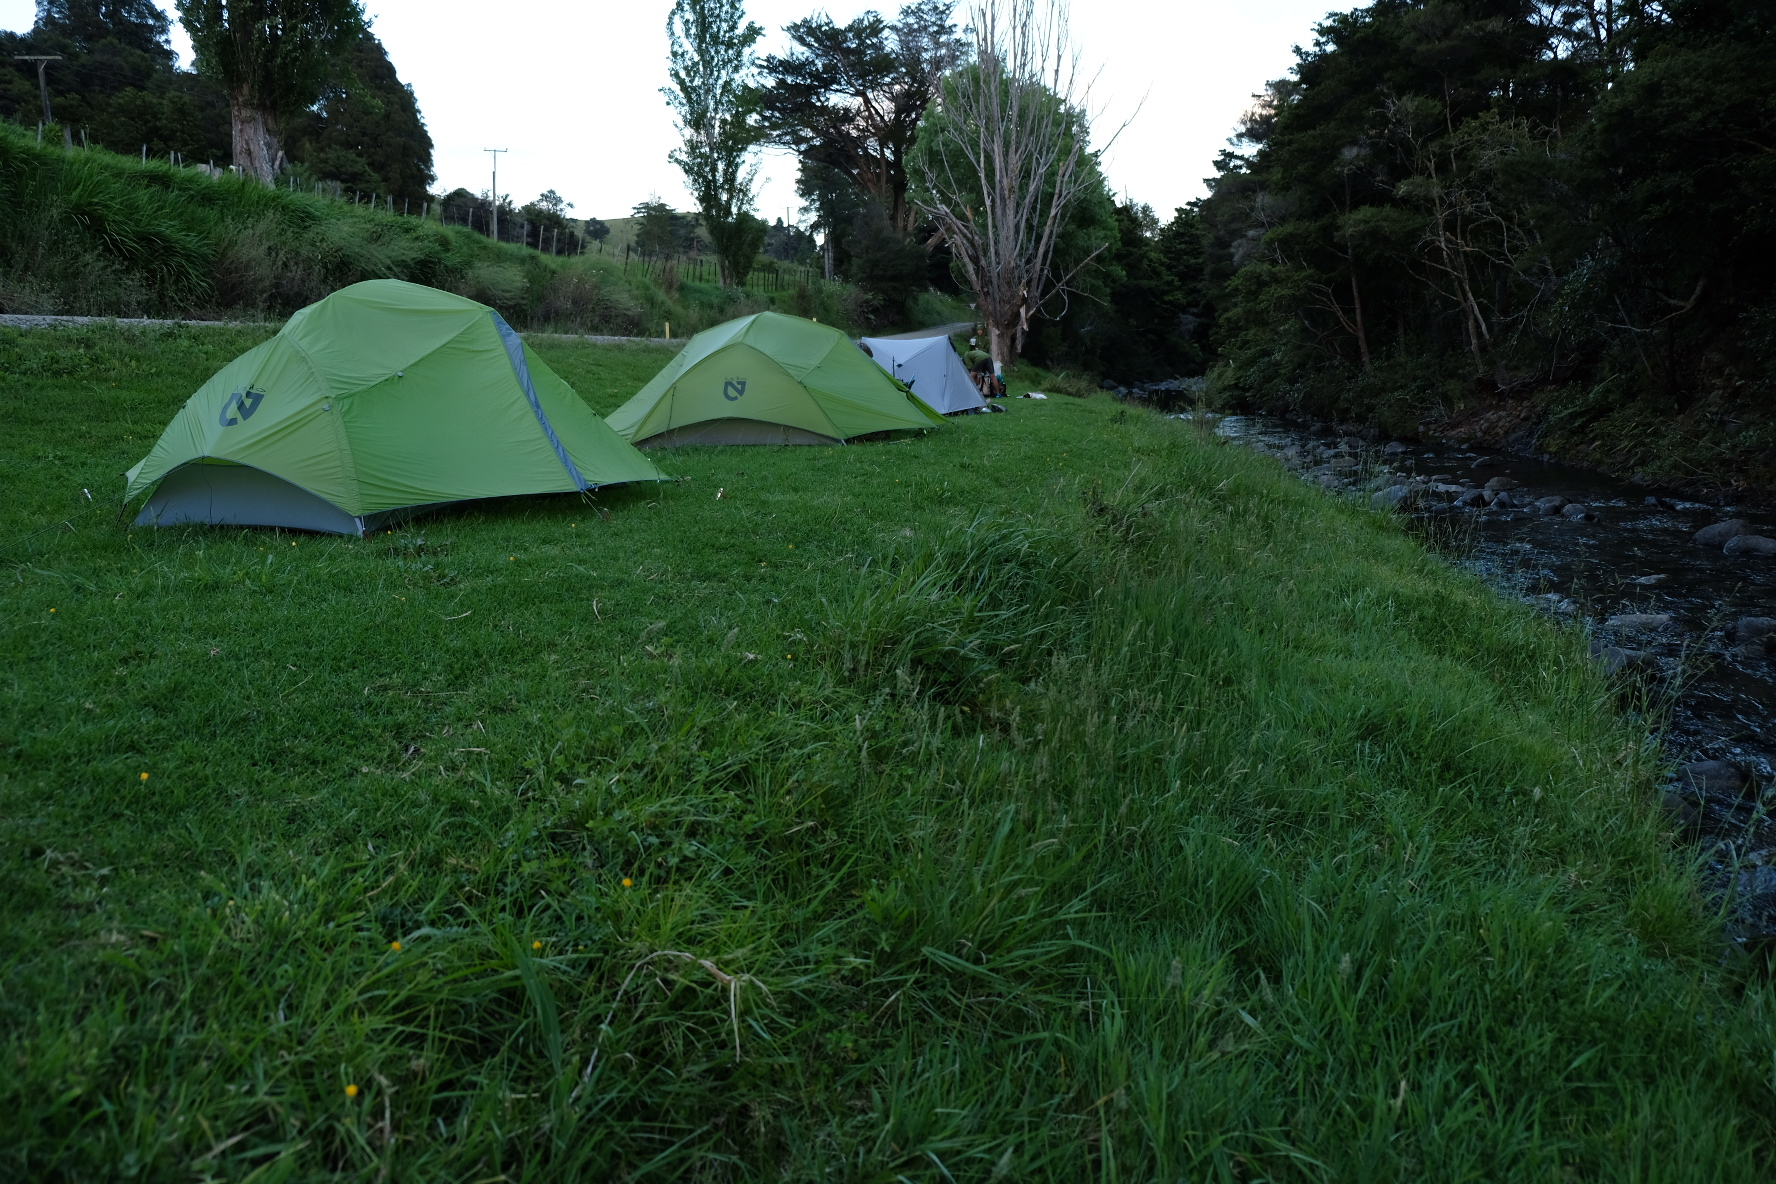 Camping near a stream before Raetea